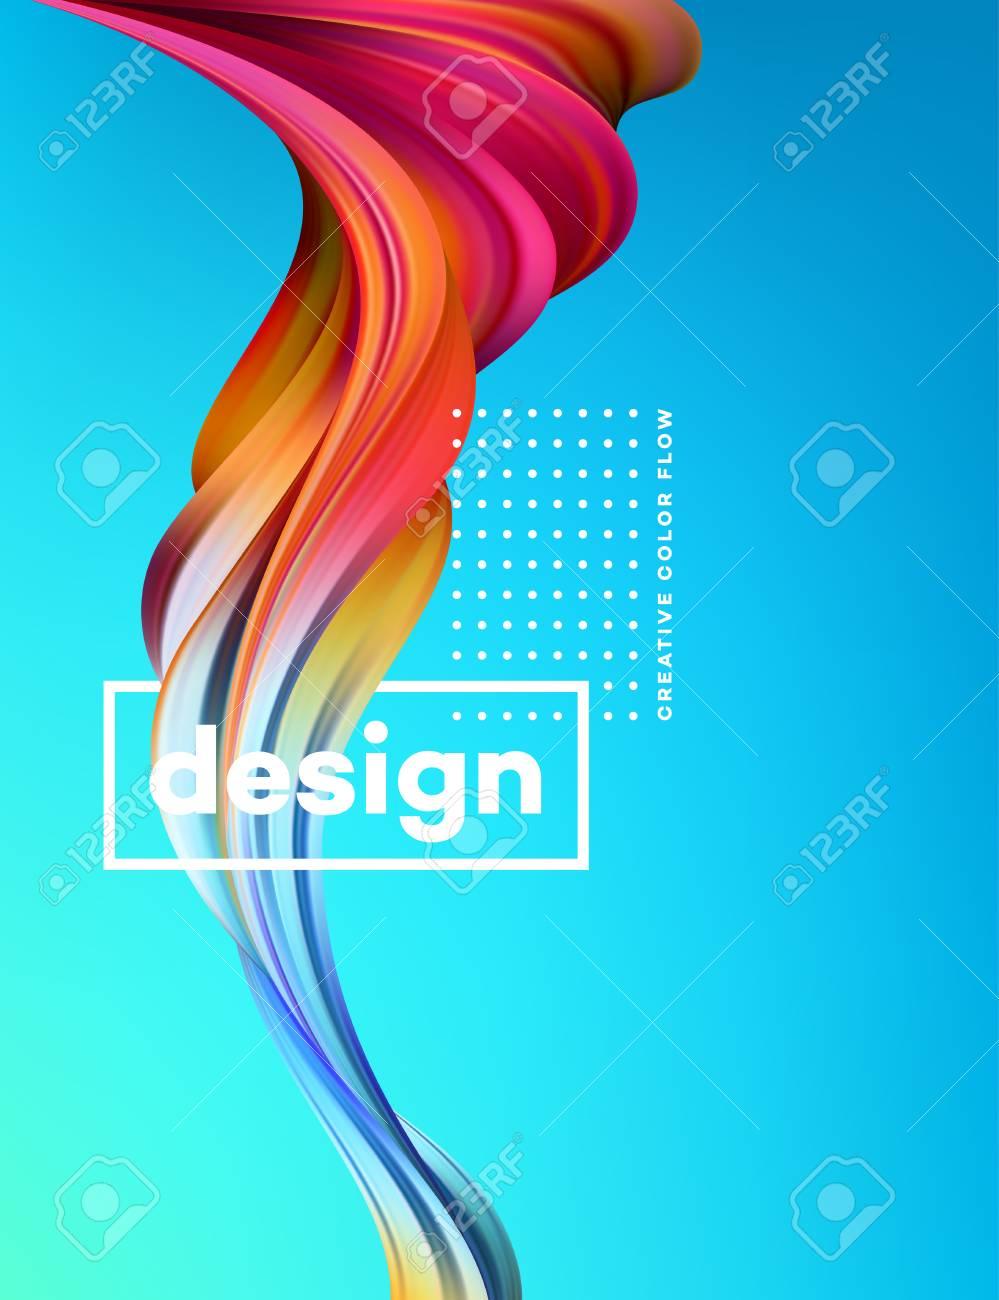 Modern colorful flow poster. Wave Liquid shape in blue color background. Art design for your design project. Vector illustration. - 94806468